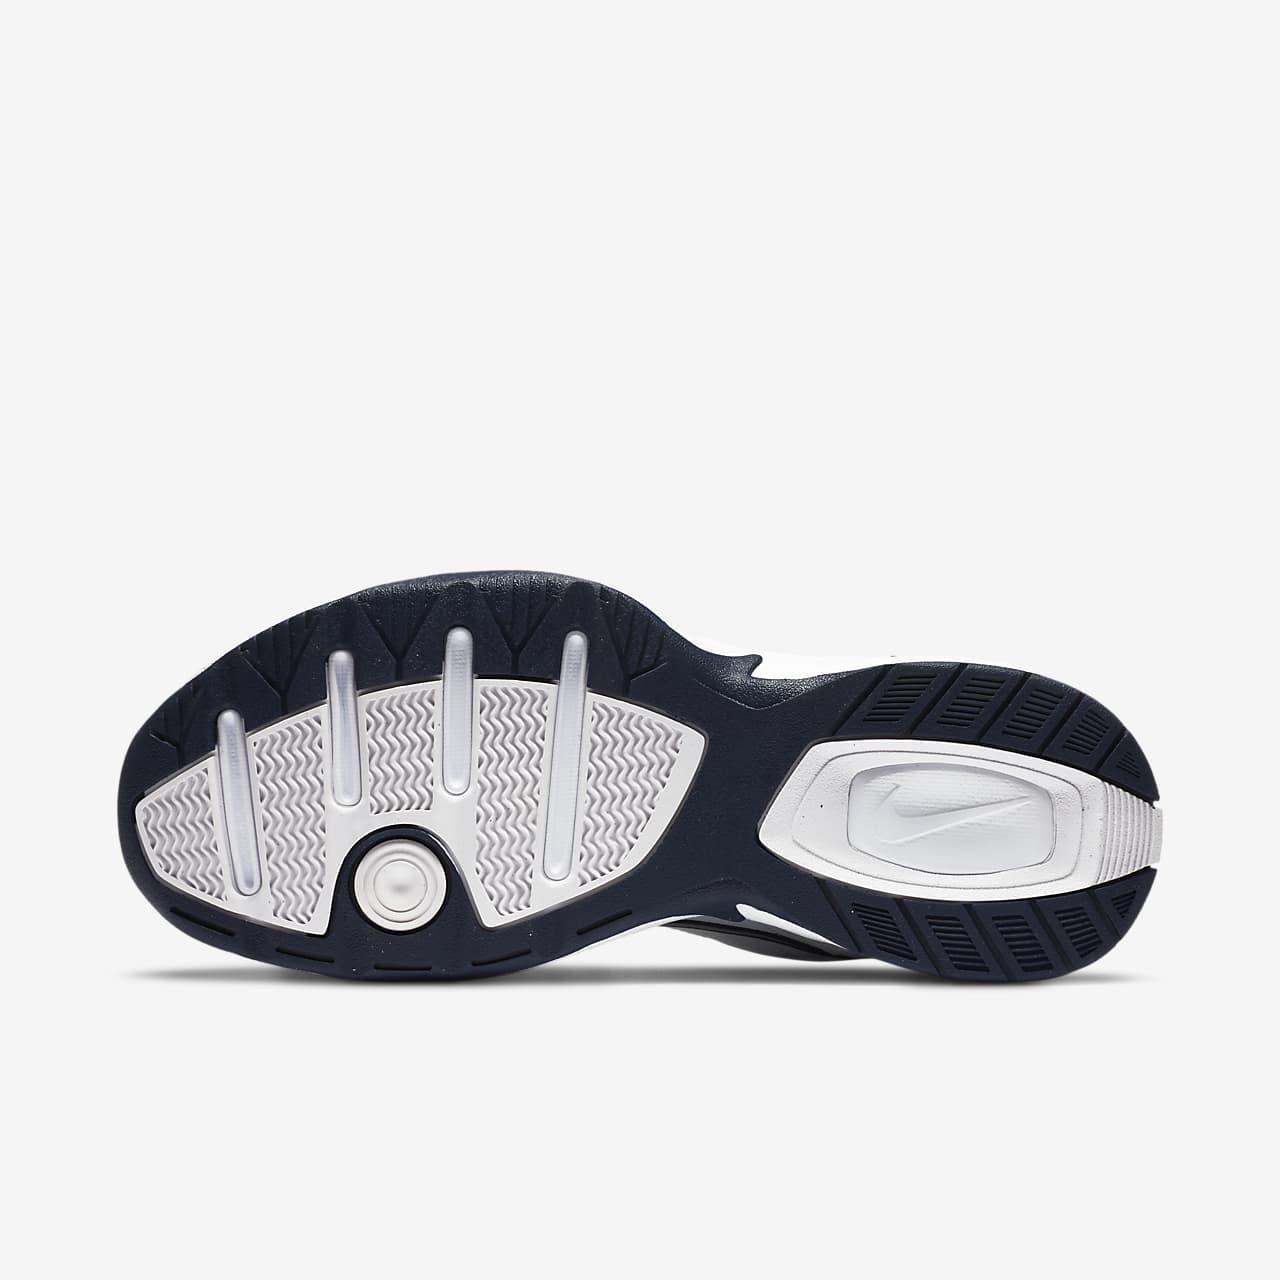 b02d6a42 ... Кроссовки для занятий в зале/на каждый день Nike Air Monarch IV